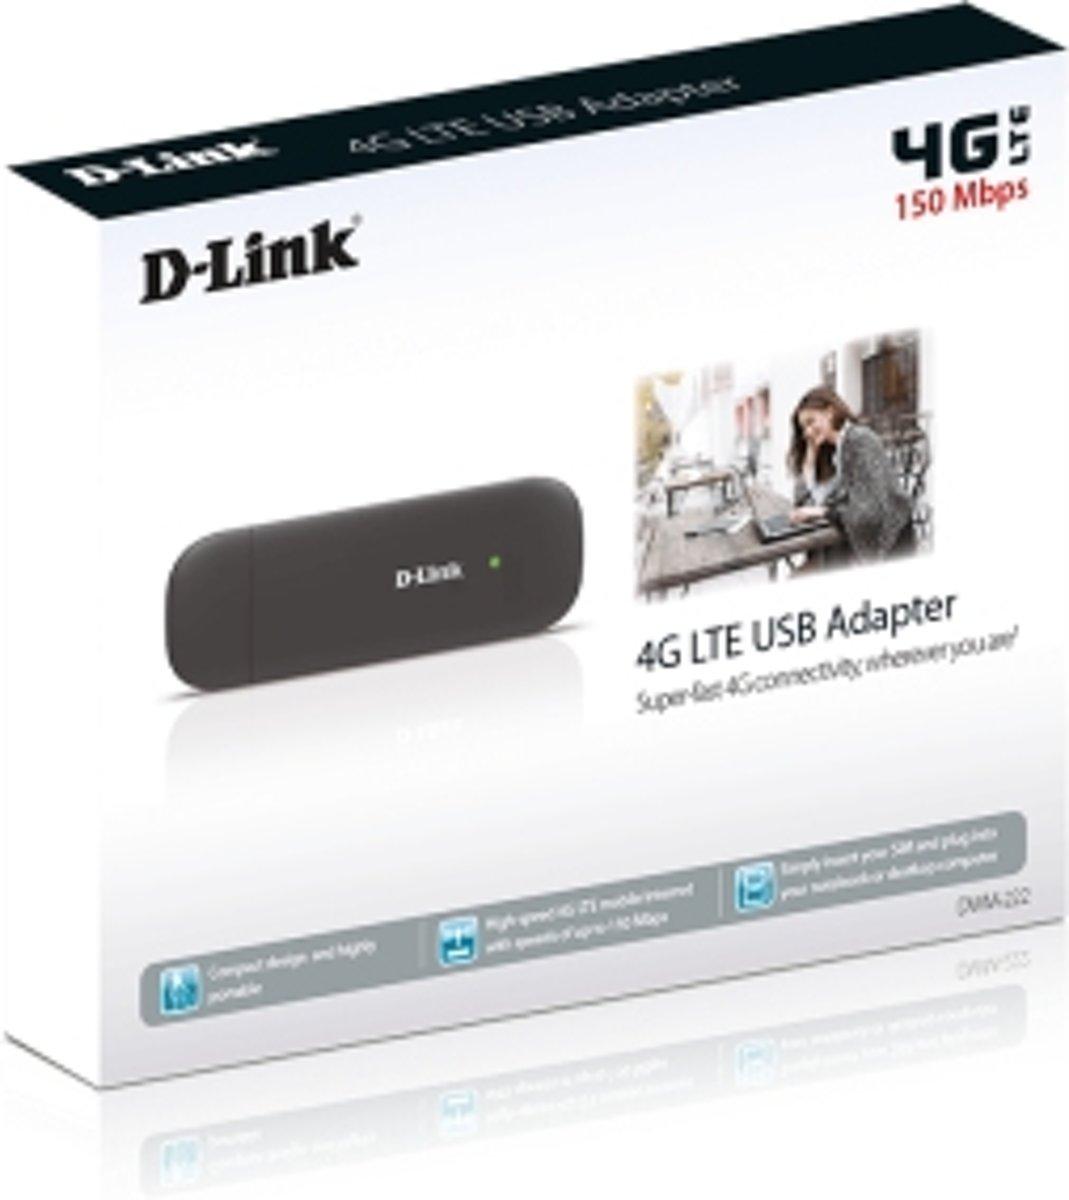 D Link Dwm 222 Mobiele Router Gateway Modem Cellular Network Modem